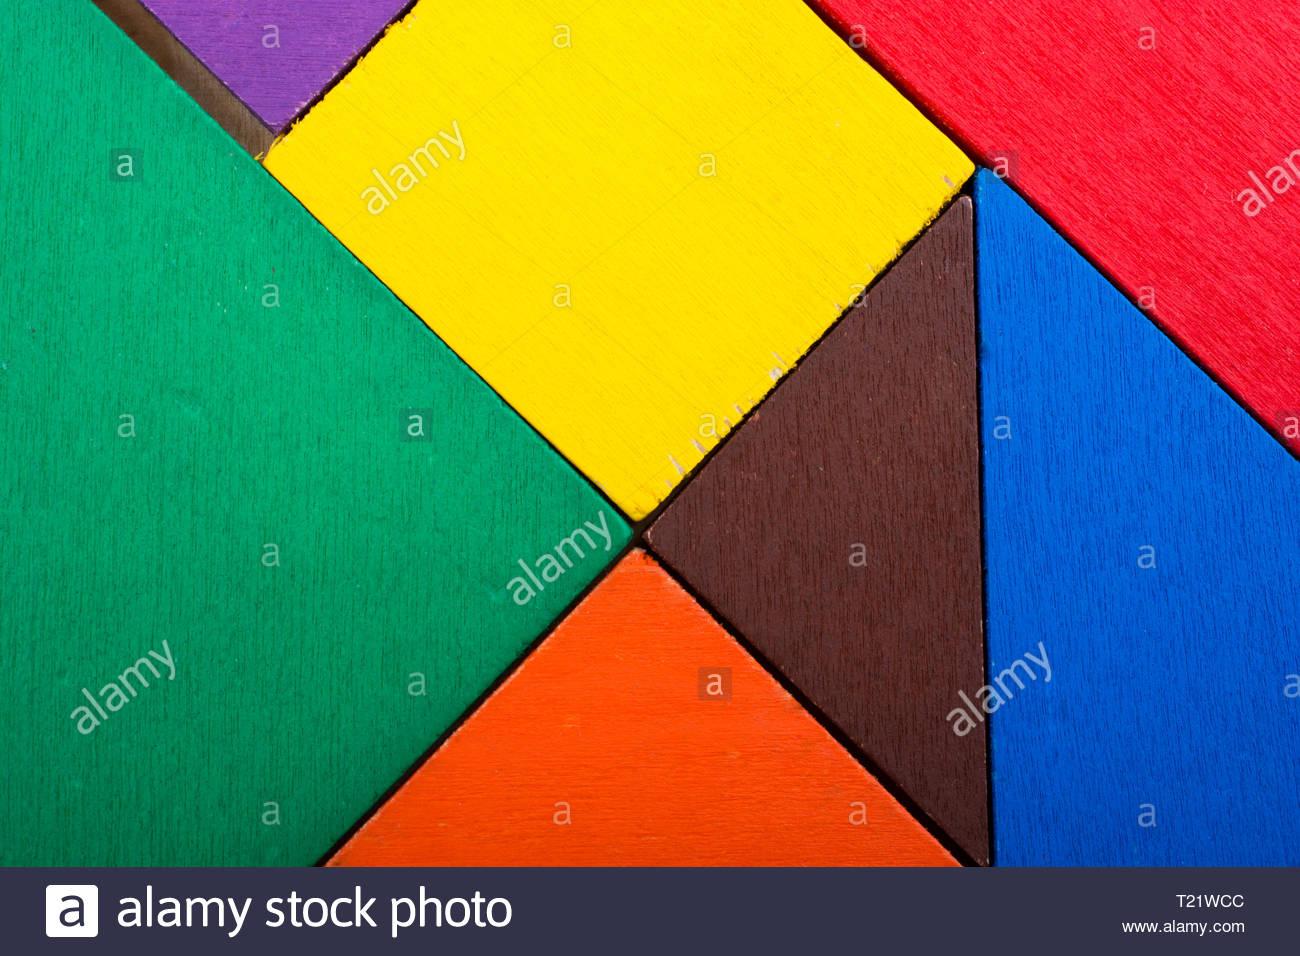 Colorful Pieces Of A Square Tangram Puzzle Stock Photo avec Pièces Tangram